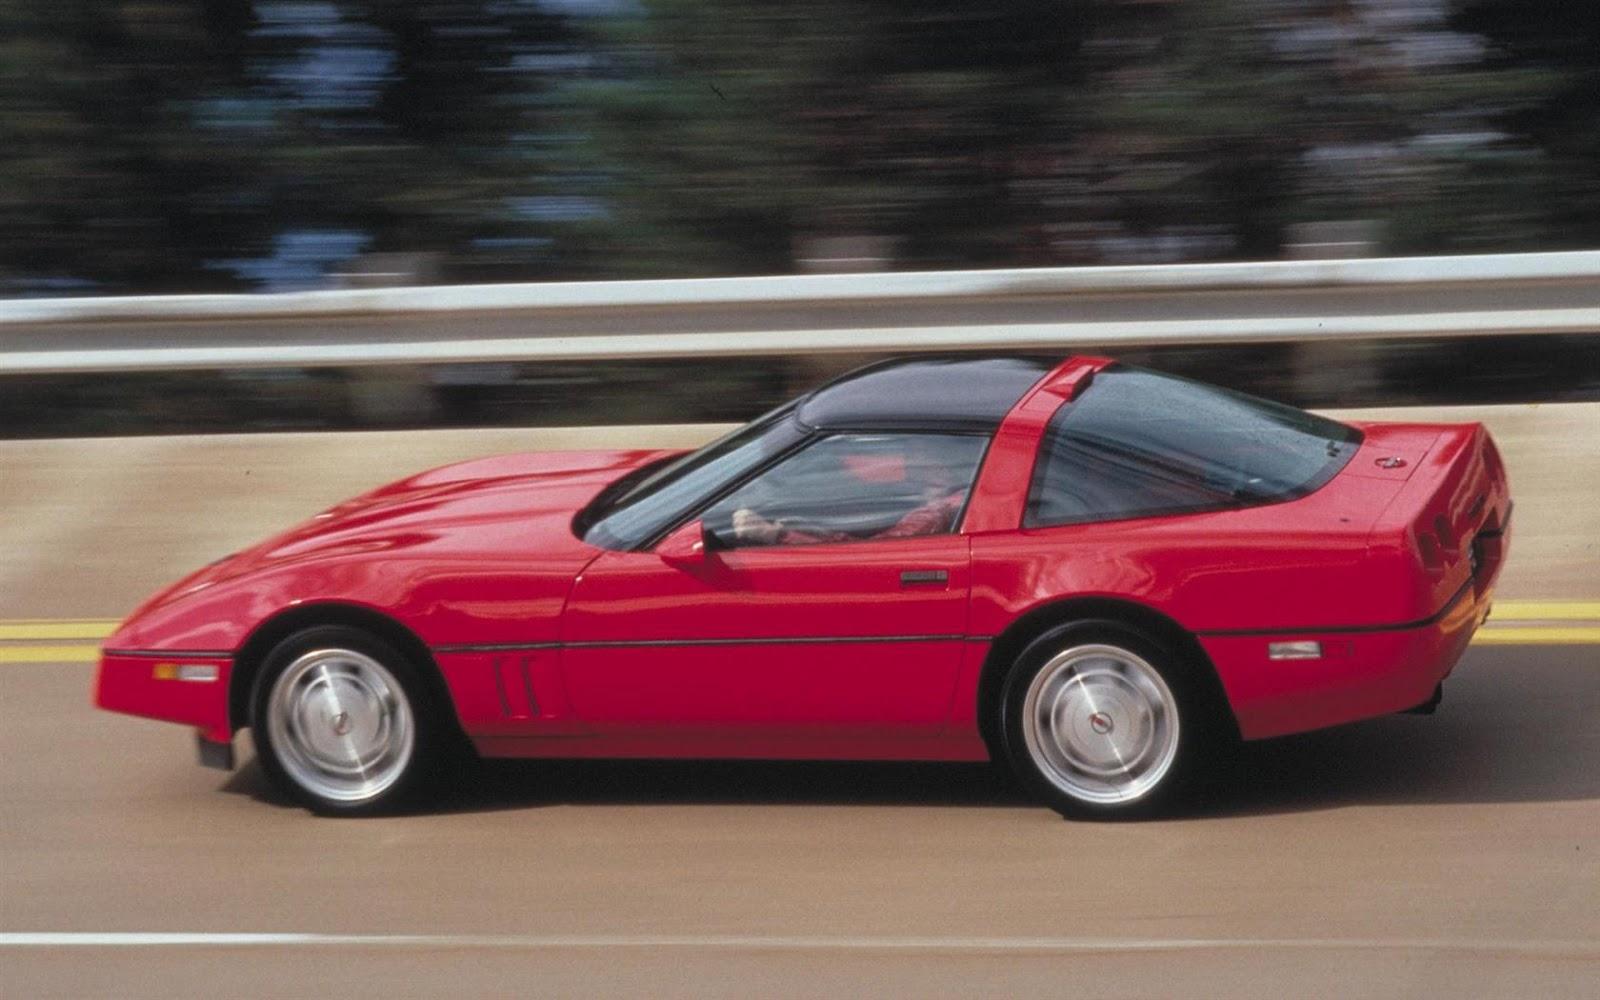 http://4.bp.blogspot.com/-x4AZILOZcps/UP2n-w5x7rI/AAAAAAAADAo/1j_d8kiKjmQ/s1600/1989-Chevrolet-Corvette-Coupe-Image-01-1680.jpg